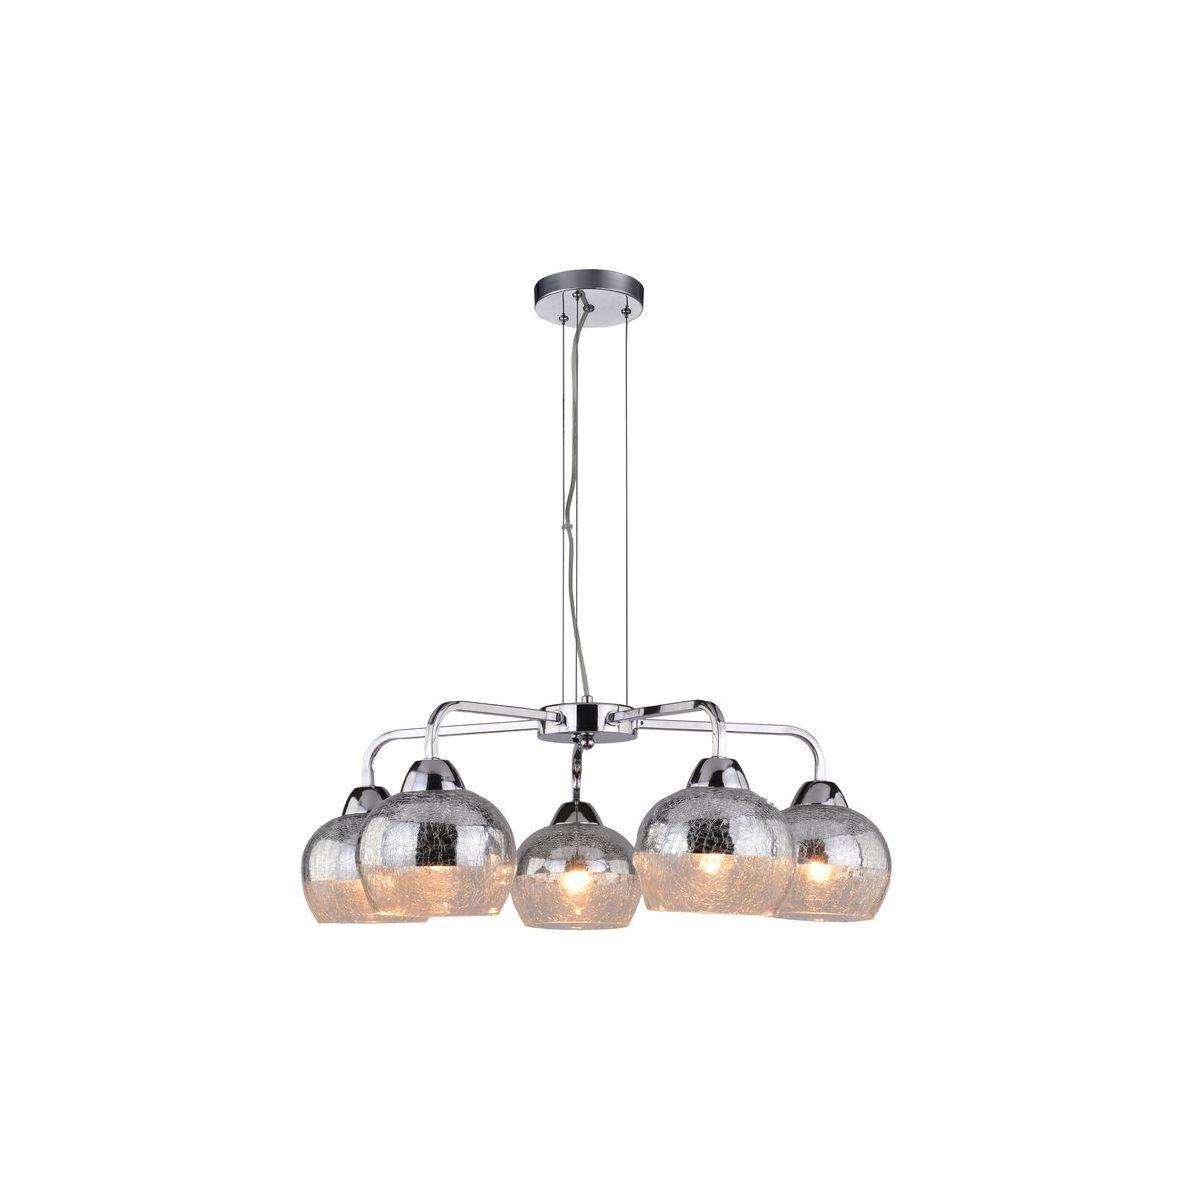 Lampa wisząca CROMINA AMPLA 5xE27 -chrom